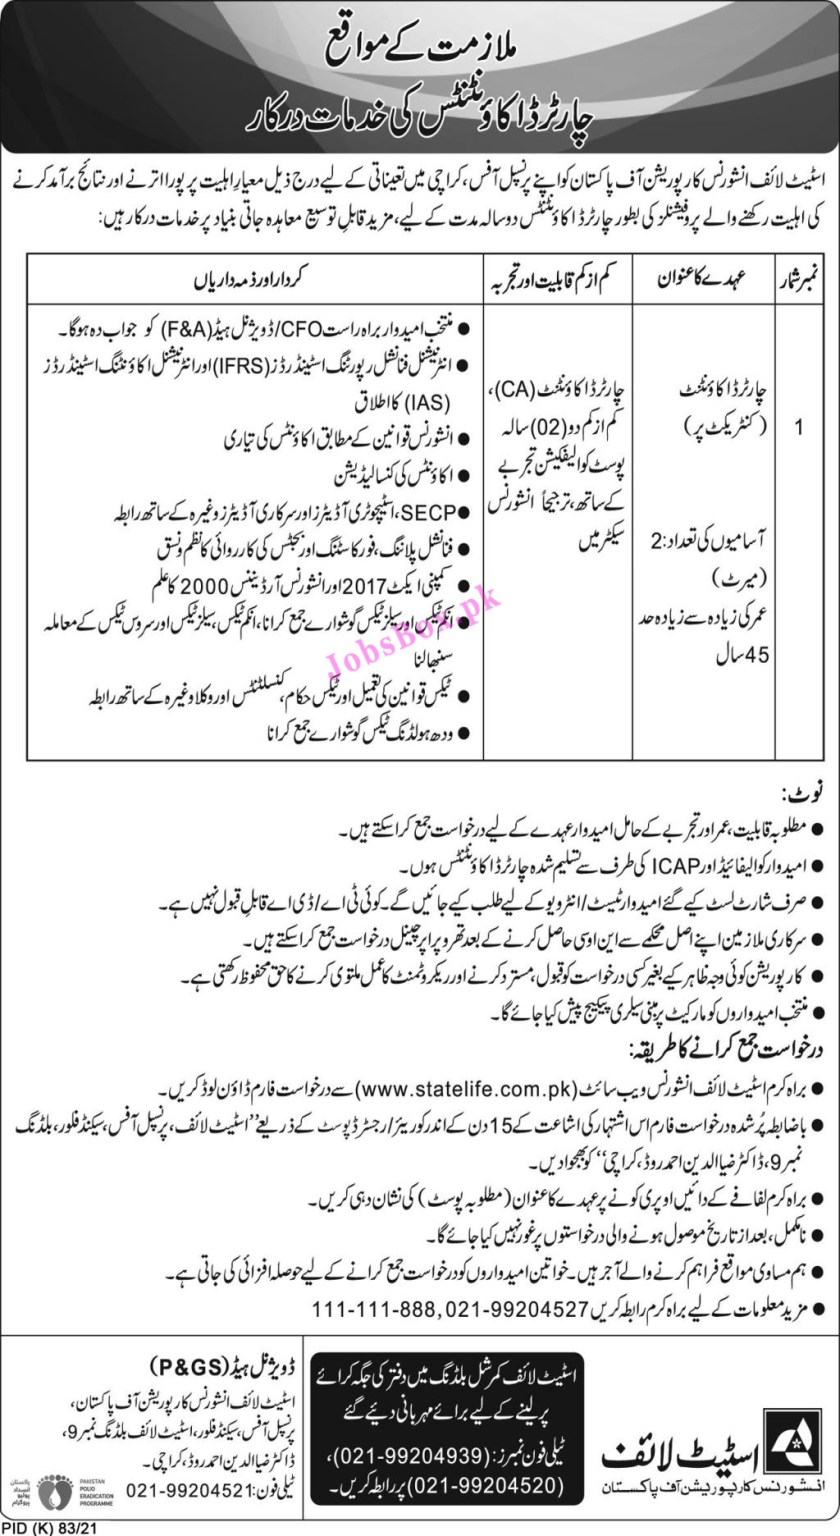 State Life Insurance Corporation Of Pakistan Jobs 2021 – www.statelife.com.pk